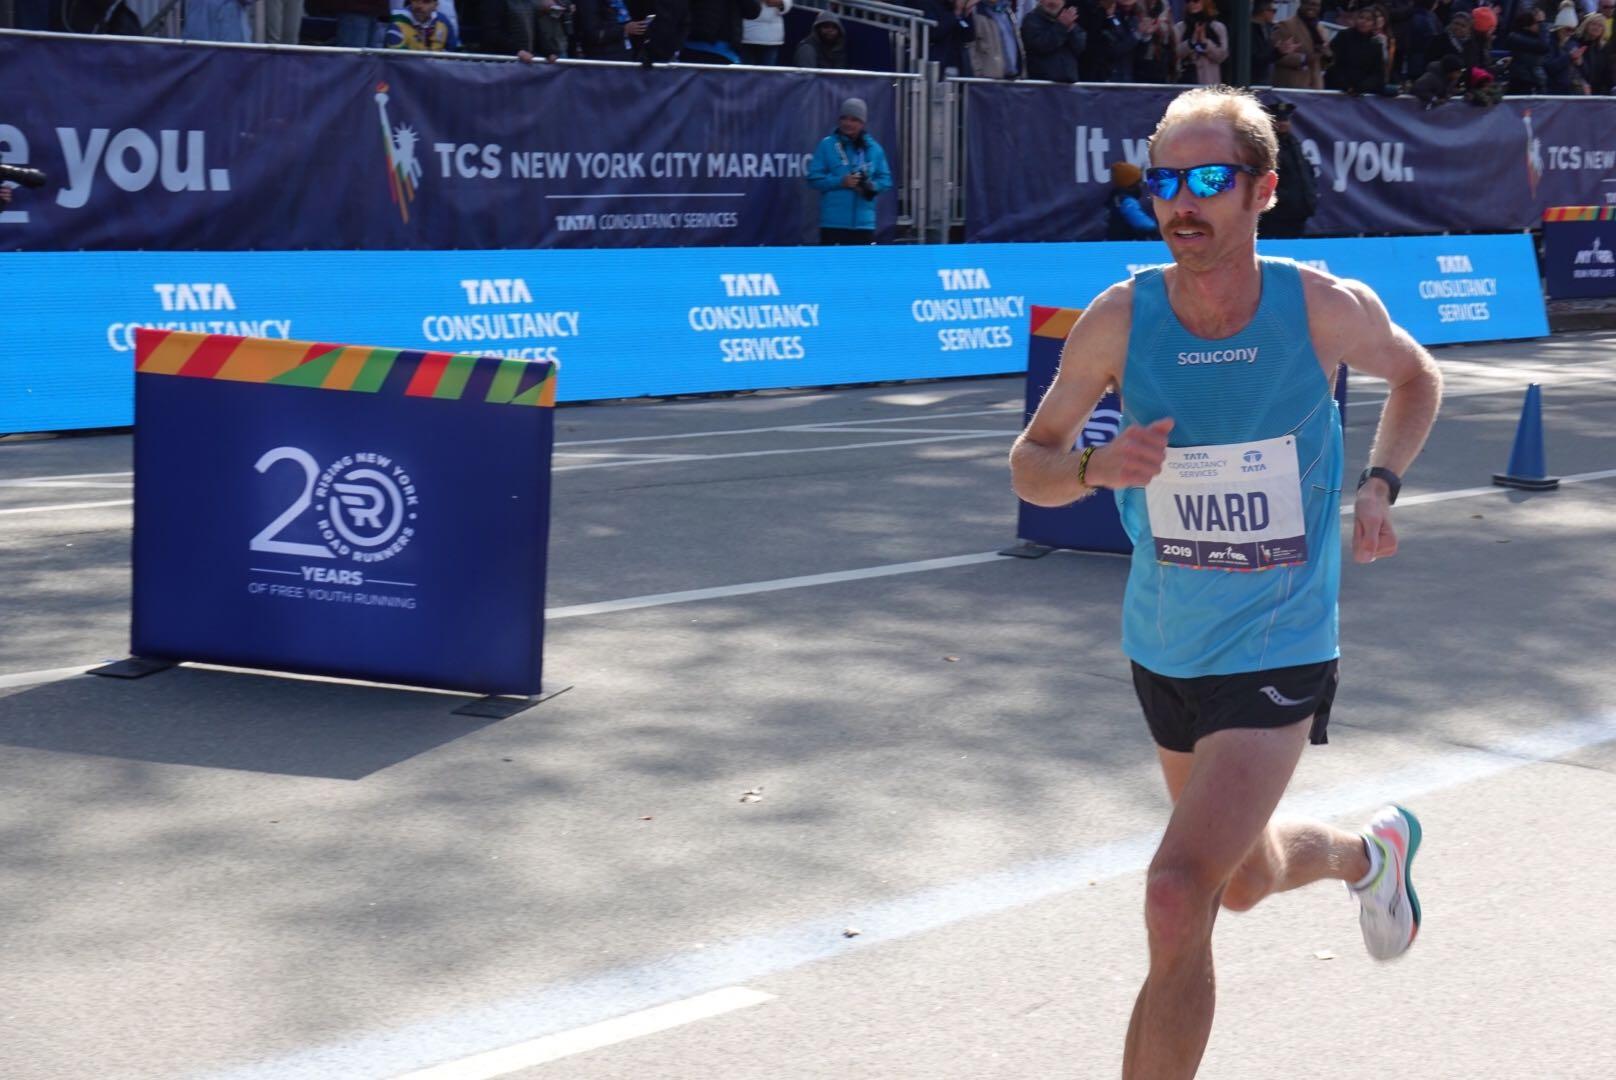 Jared Ward, top American in the 2019 New York City Marathon